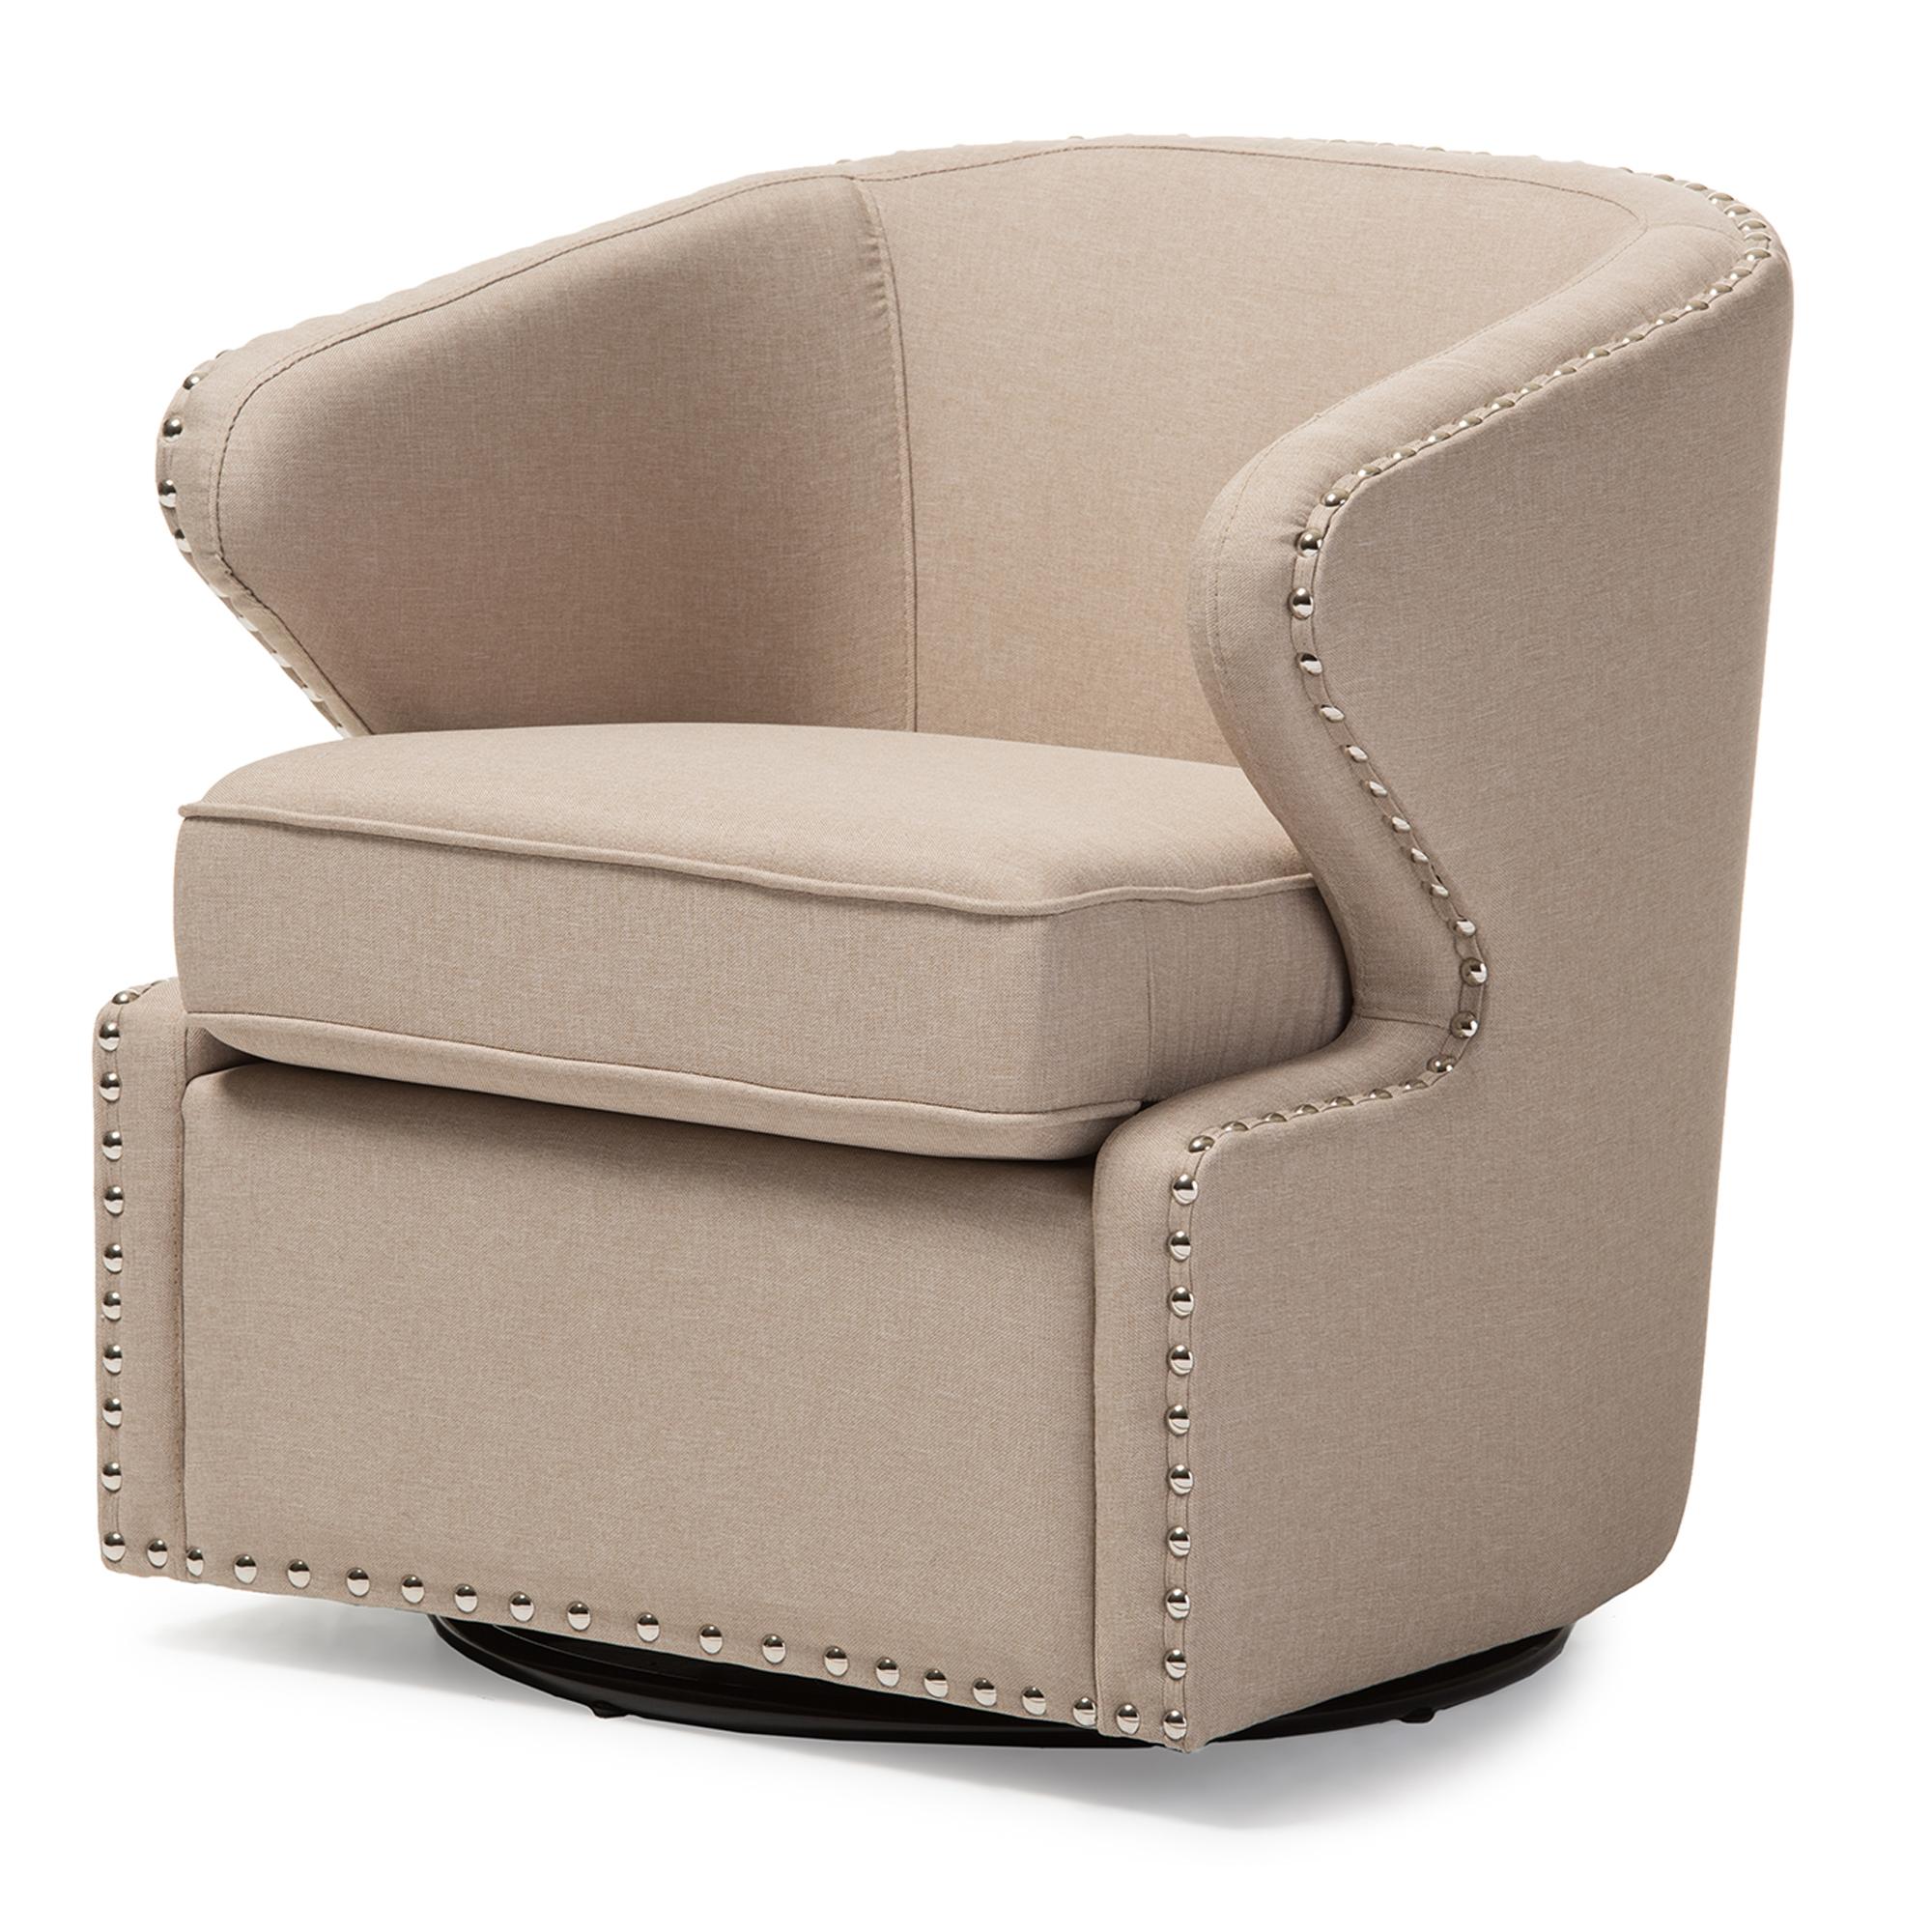 Superieur ... Baxton Studio Finley Mid Century Modern Beige Fabric Upholstered Swivel  Armchair   IEDB 203 ...